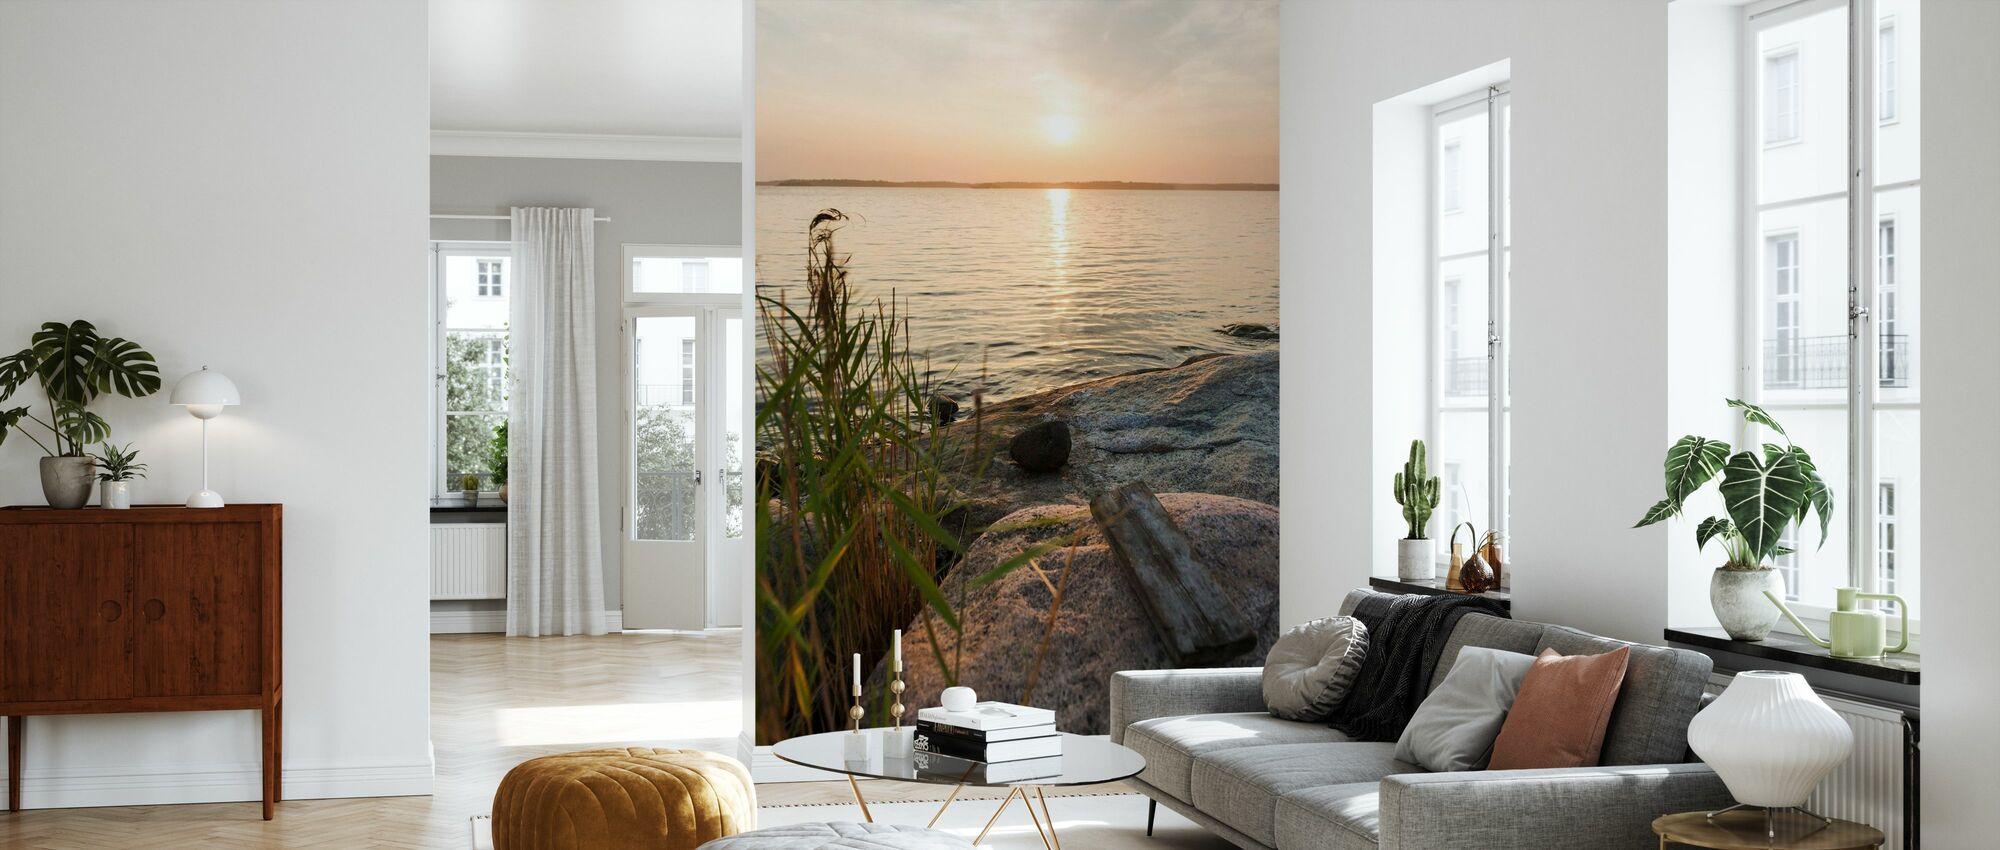 Sunset over Nässlingen, Sweden - Wallpaper - Living Room